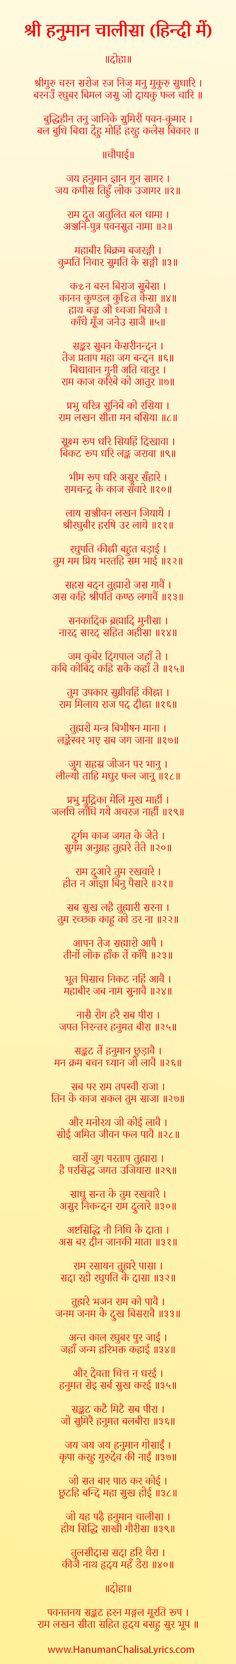 hanuman chalisa in hindi images jay shreeram